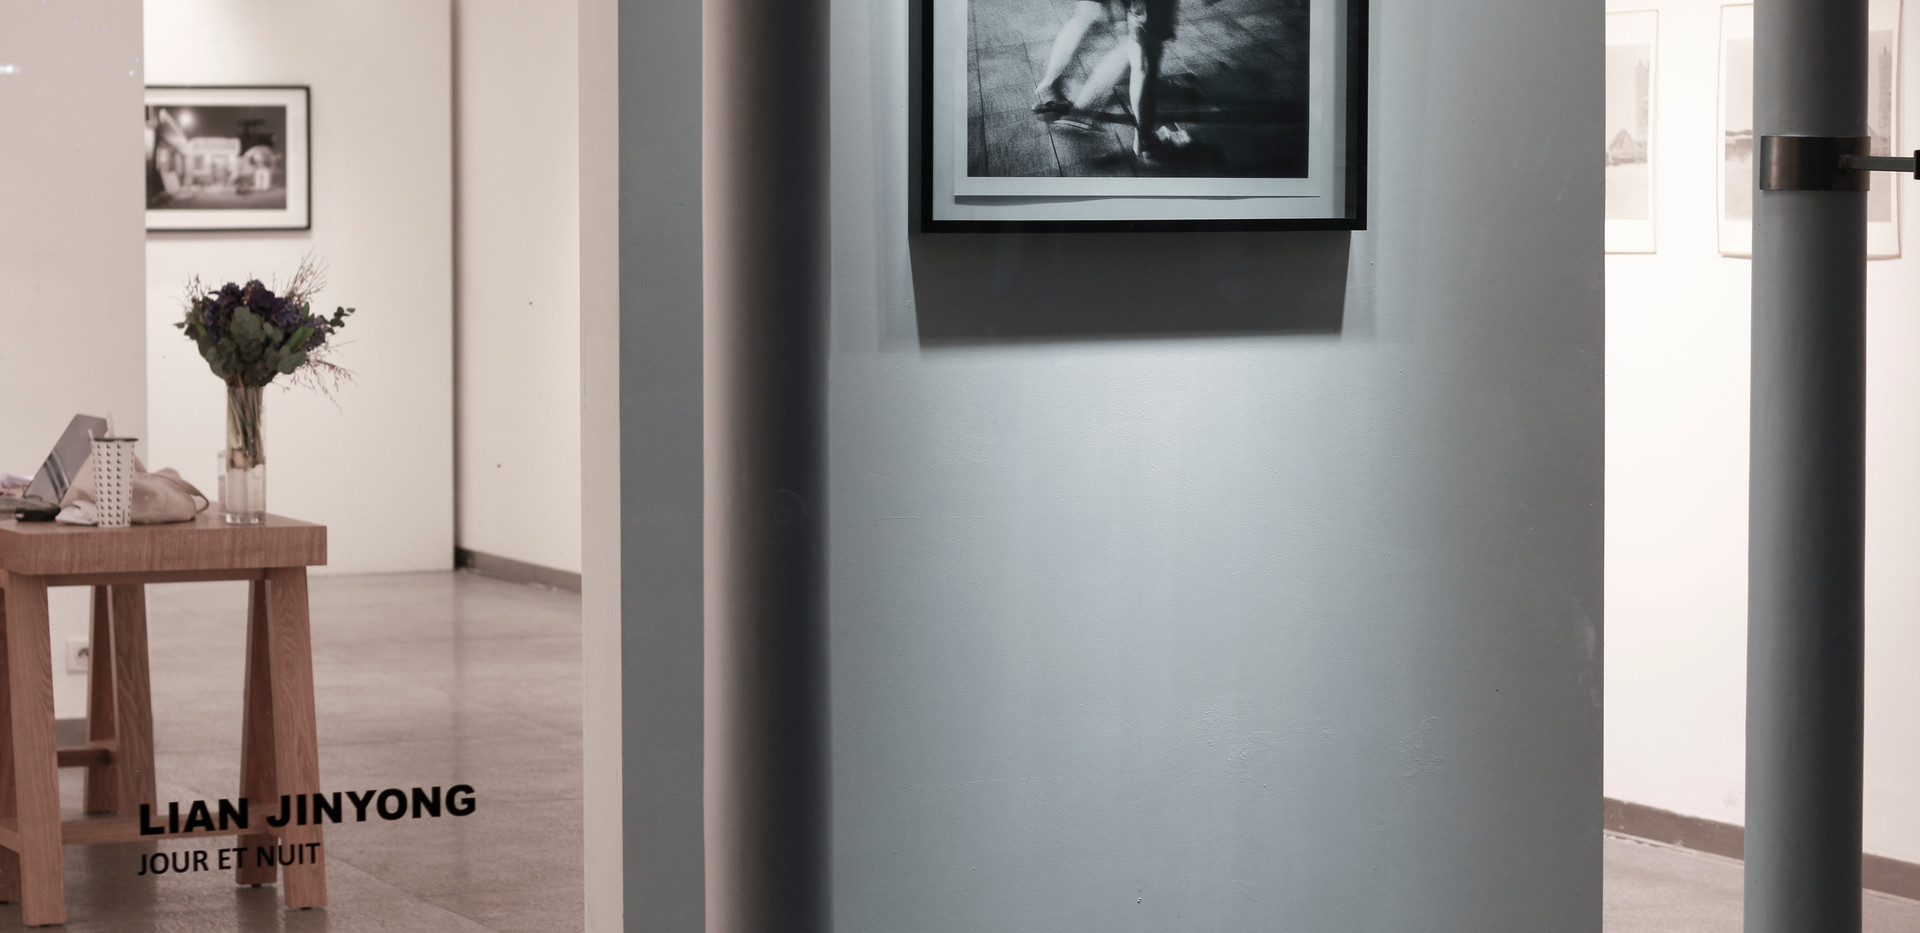 jinyong lian-galerie paris horizon-06.jp